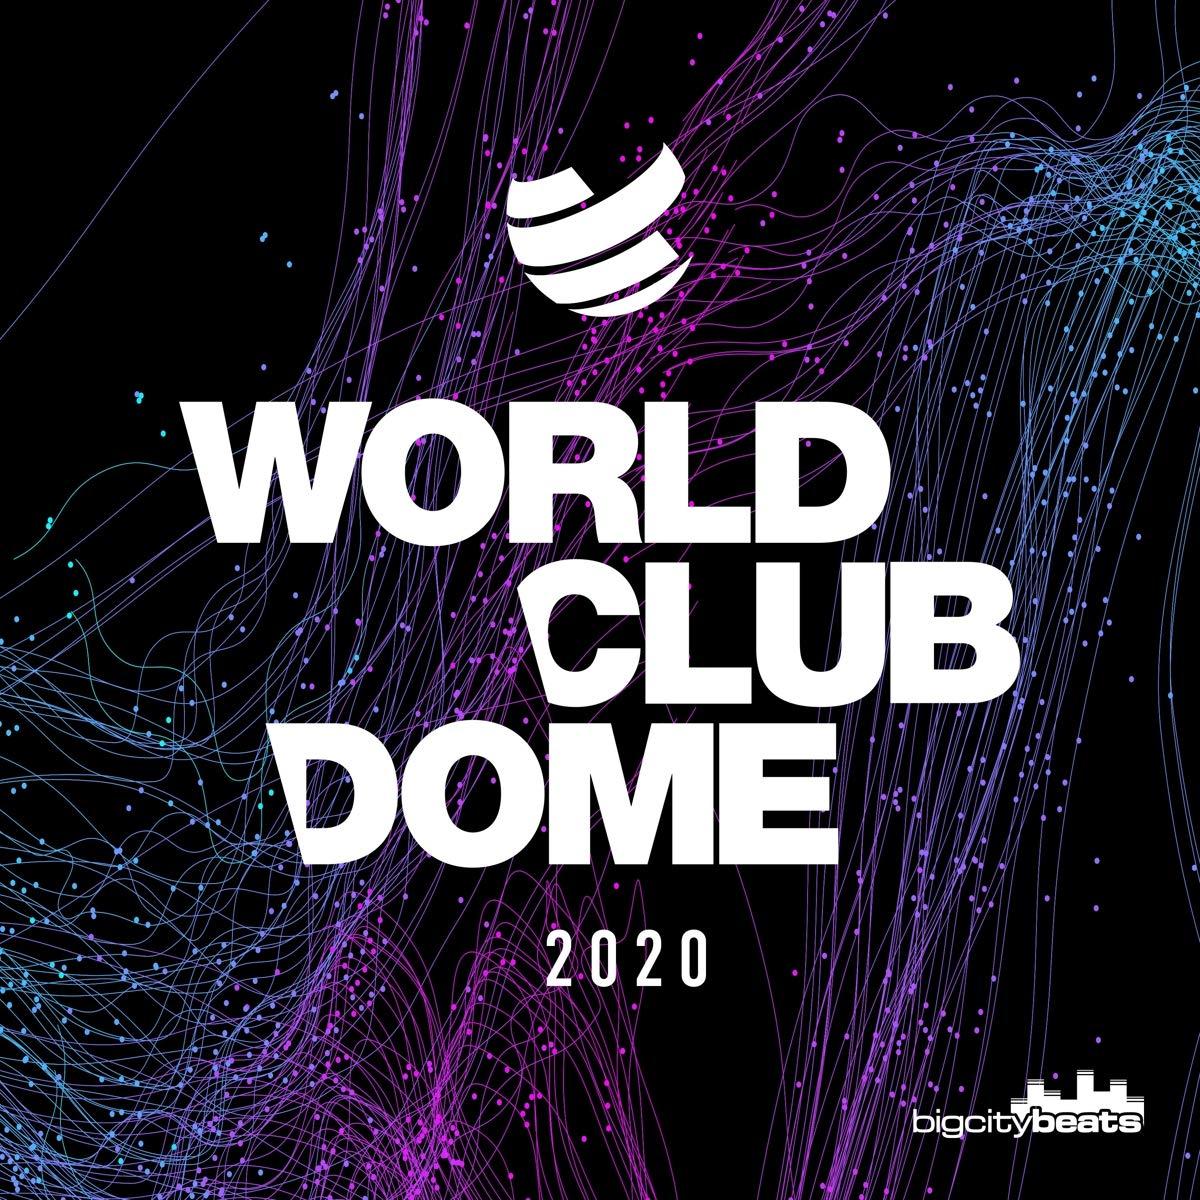 VA – World Club Dome 2020 (2020) [FLAC]